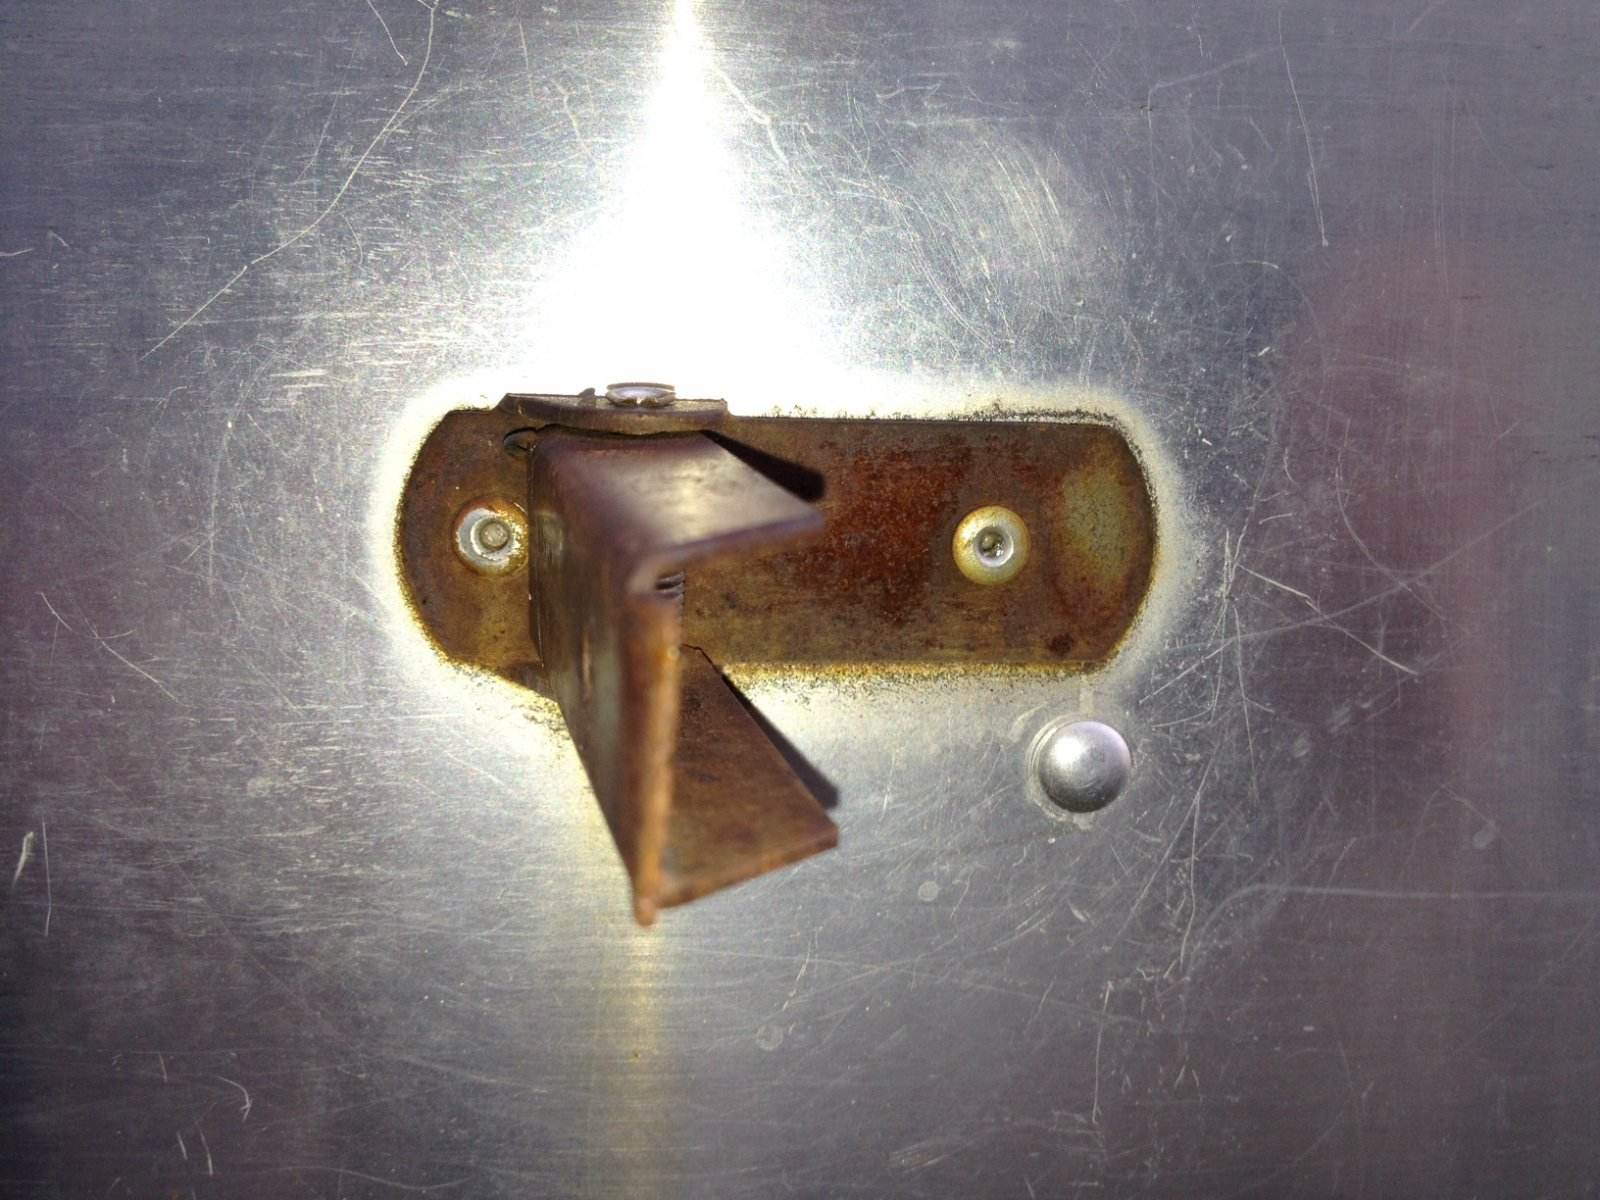 Click image for larger version  Name:door catch rivet.jpg Views:95 Size:313.2 KB ID:164285